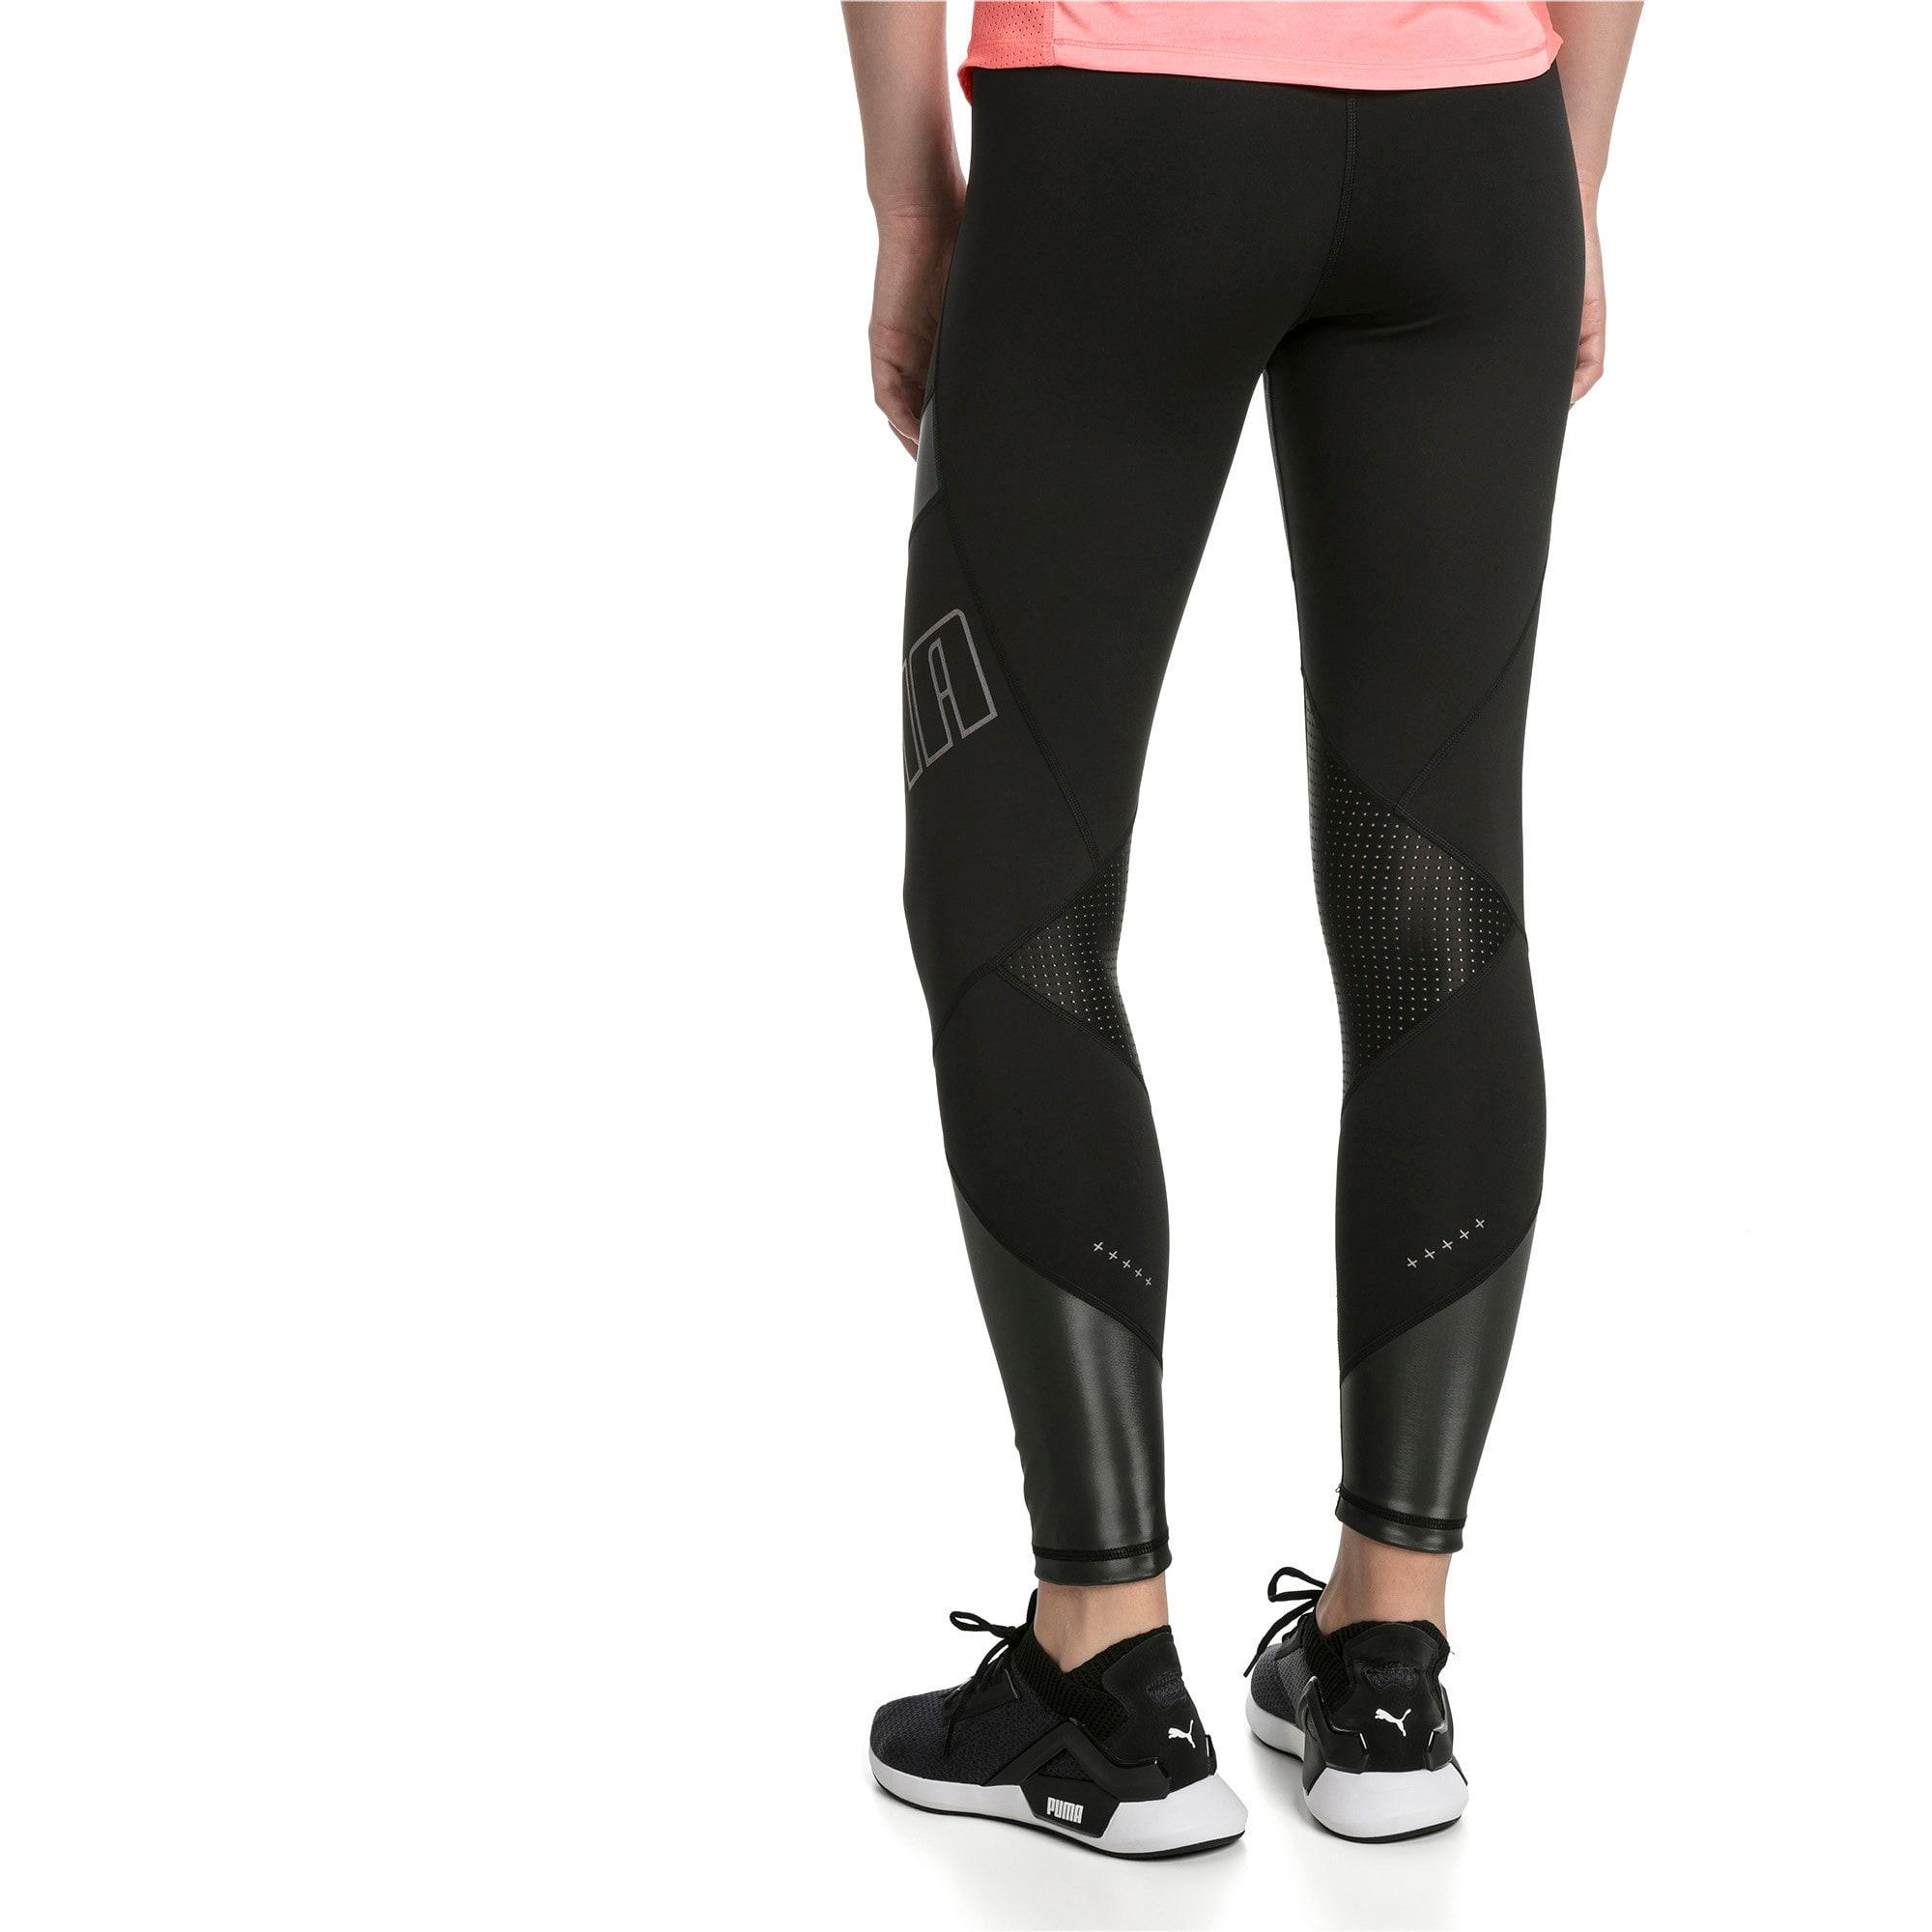 Thumbnail 2 of Elite Women's Running Leggings, Puma Black, medium-IND